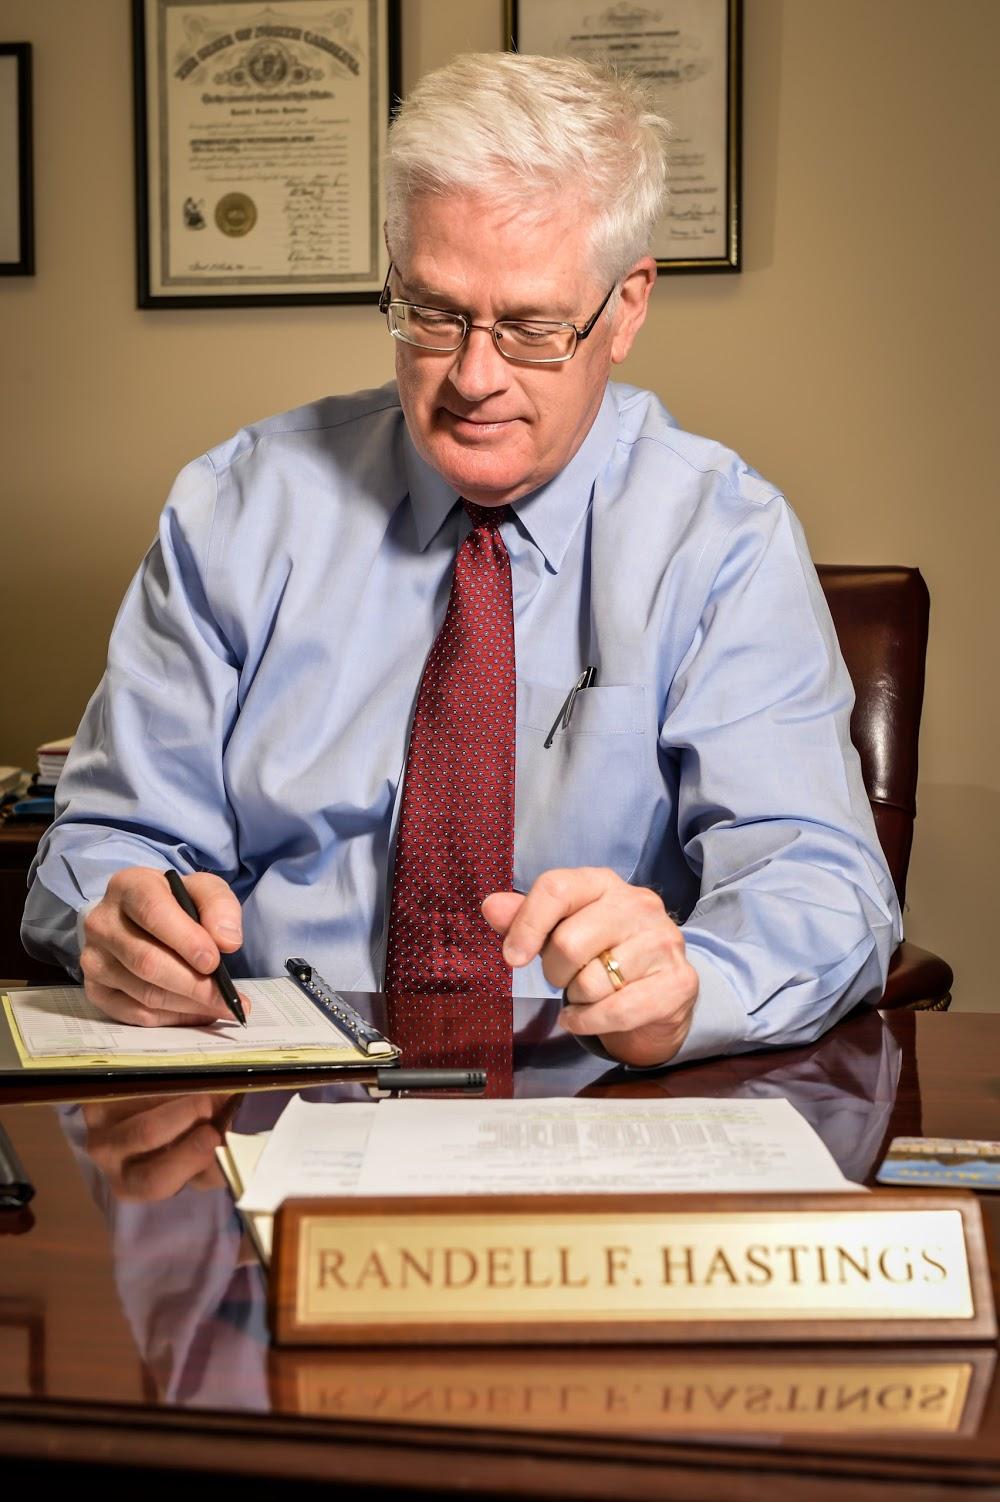 Randell F Hastings Law Office